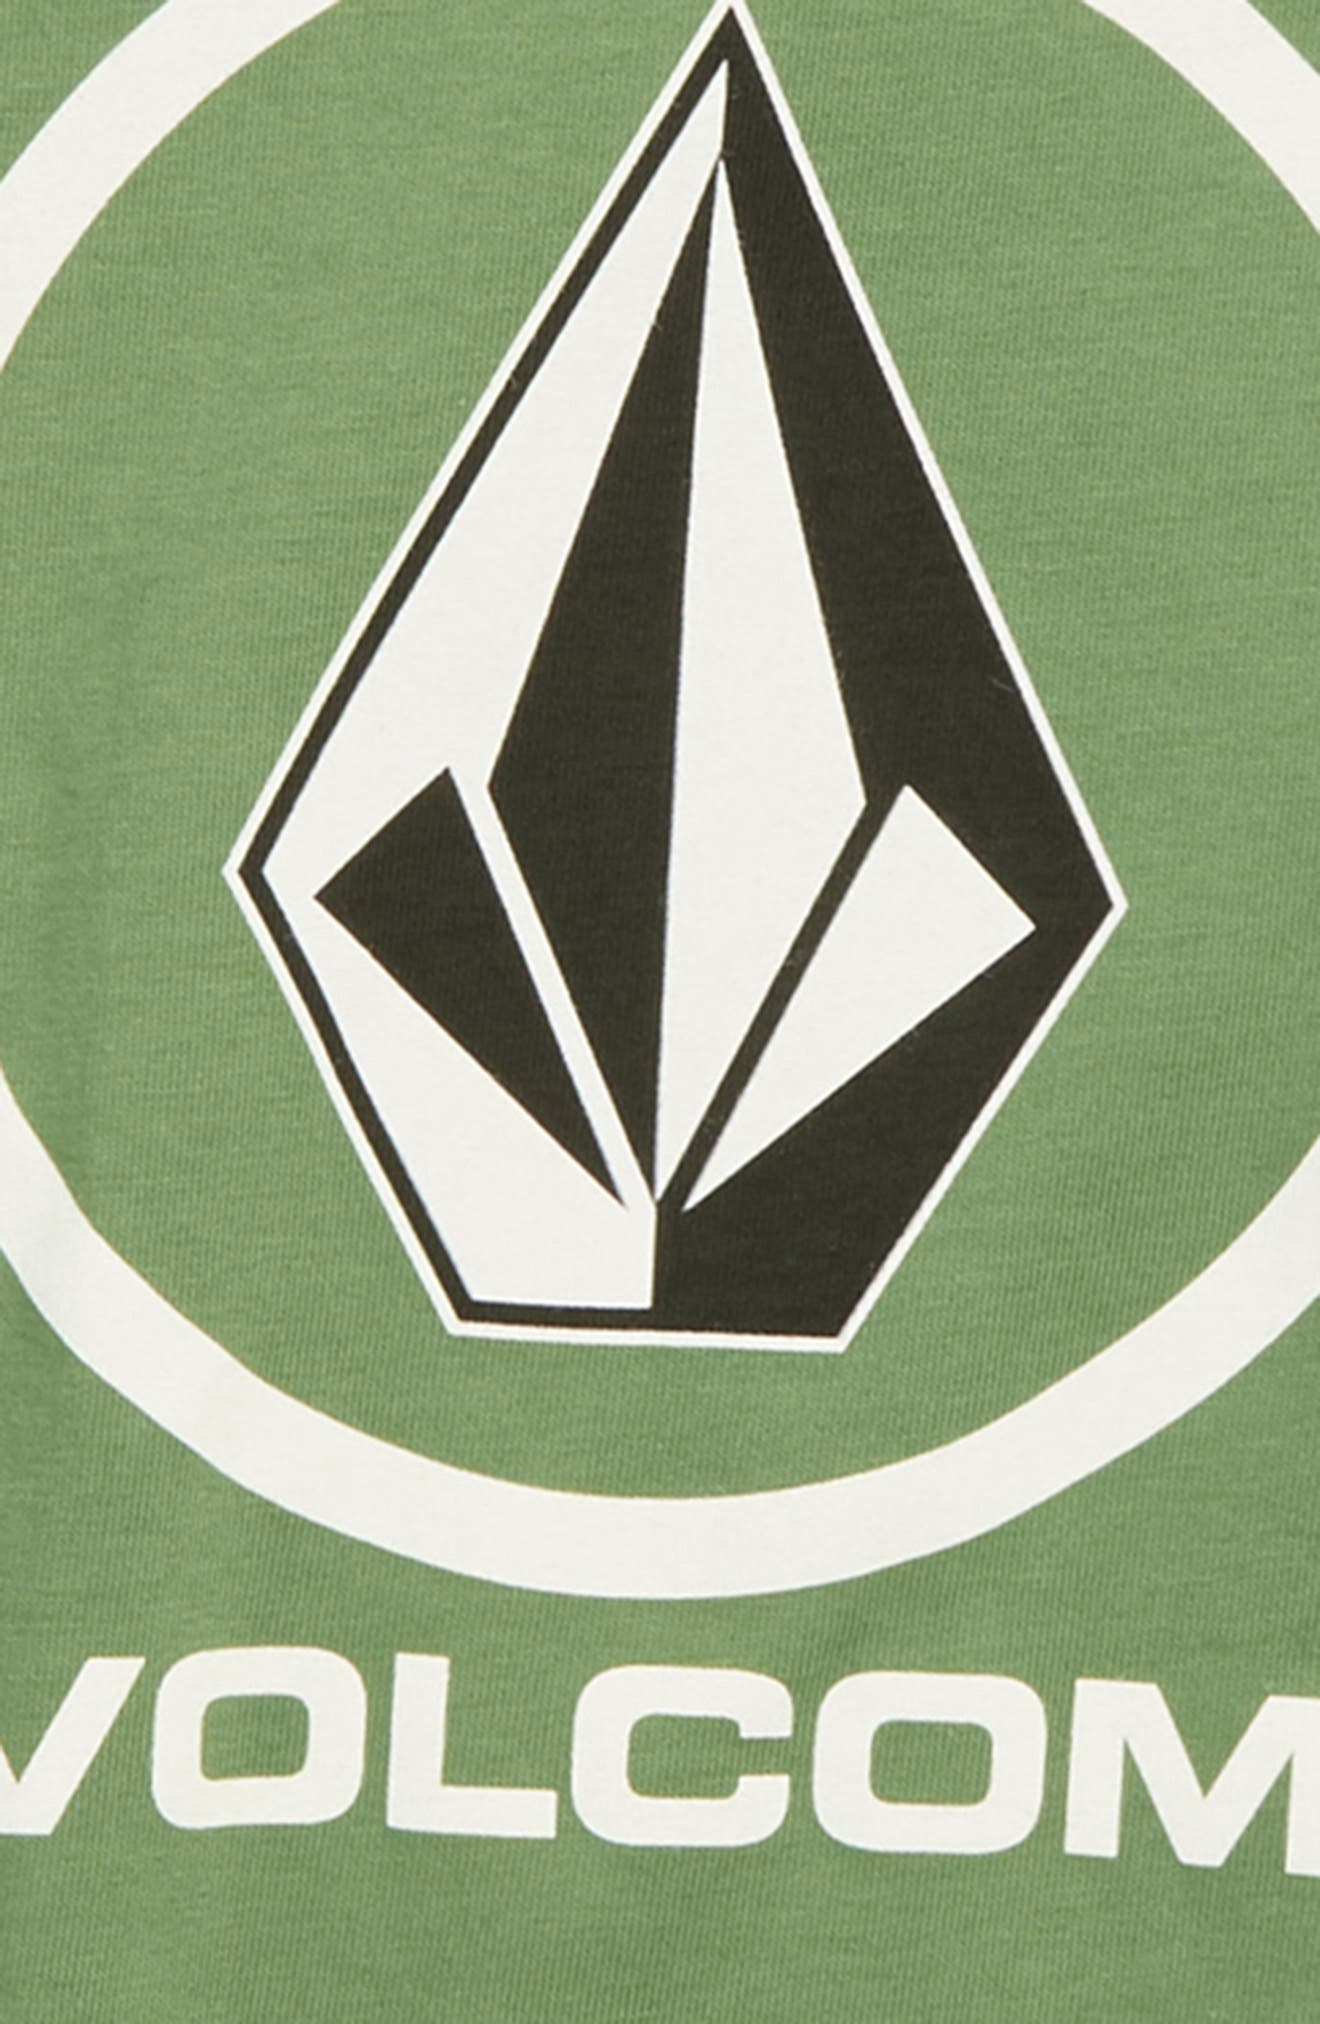 Crisp Stone Logo Graphic T-Shirt,                             Alternate thumbnail 3, color,                             DARK KELLY